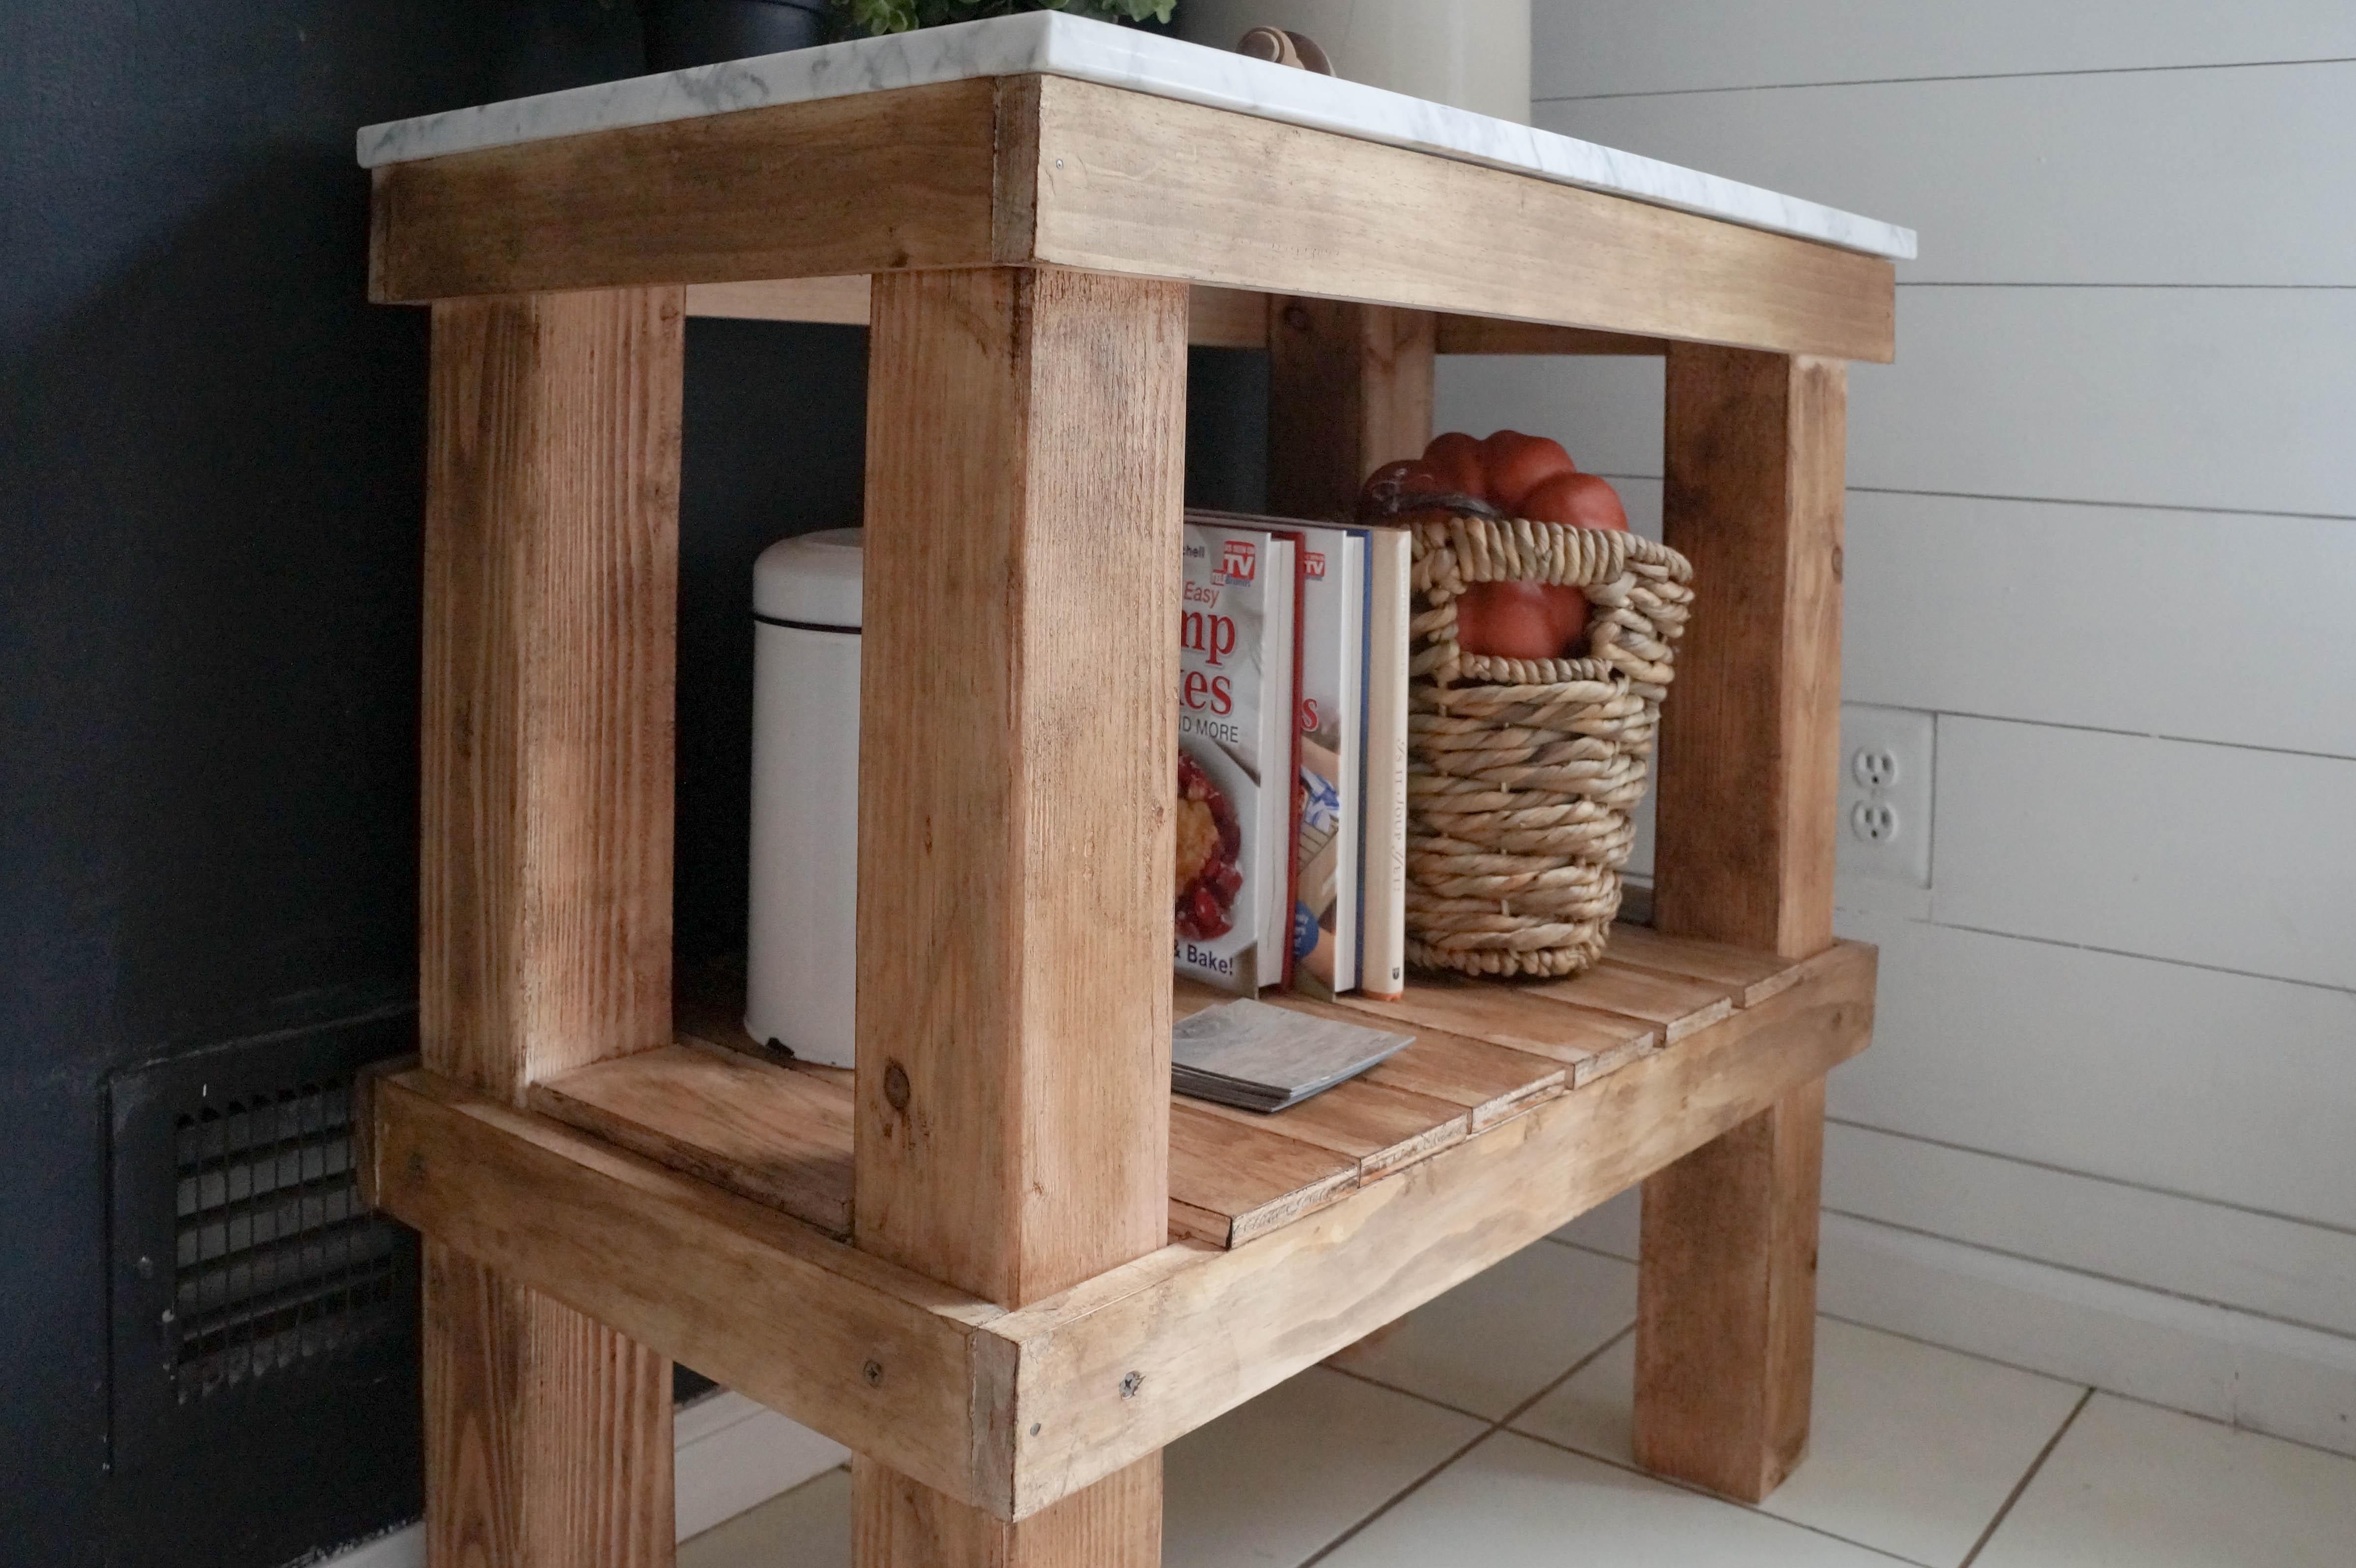 diy rustic bar. DIY Rustic Cart 3 Kitchen  with Marble Top Seeking Lavendar Lane